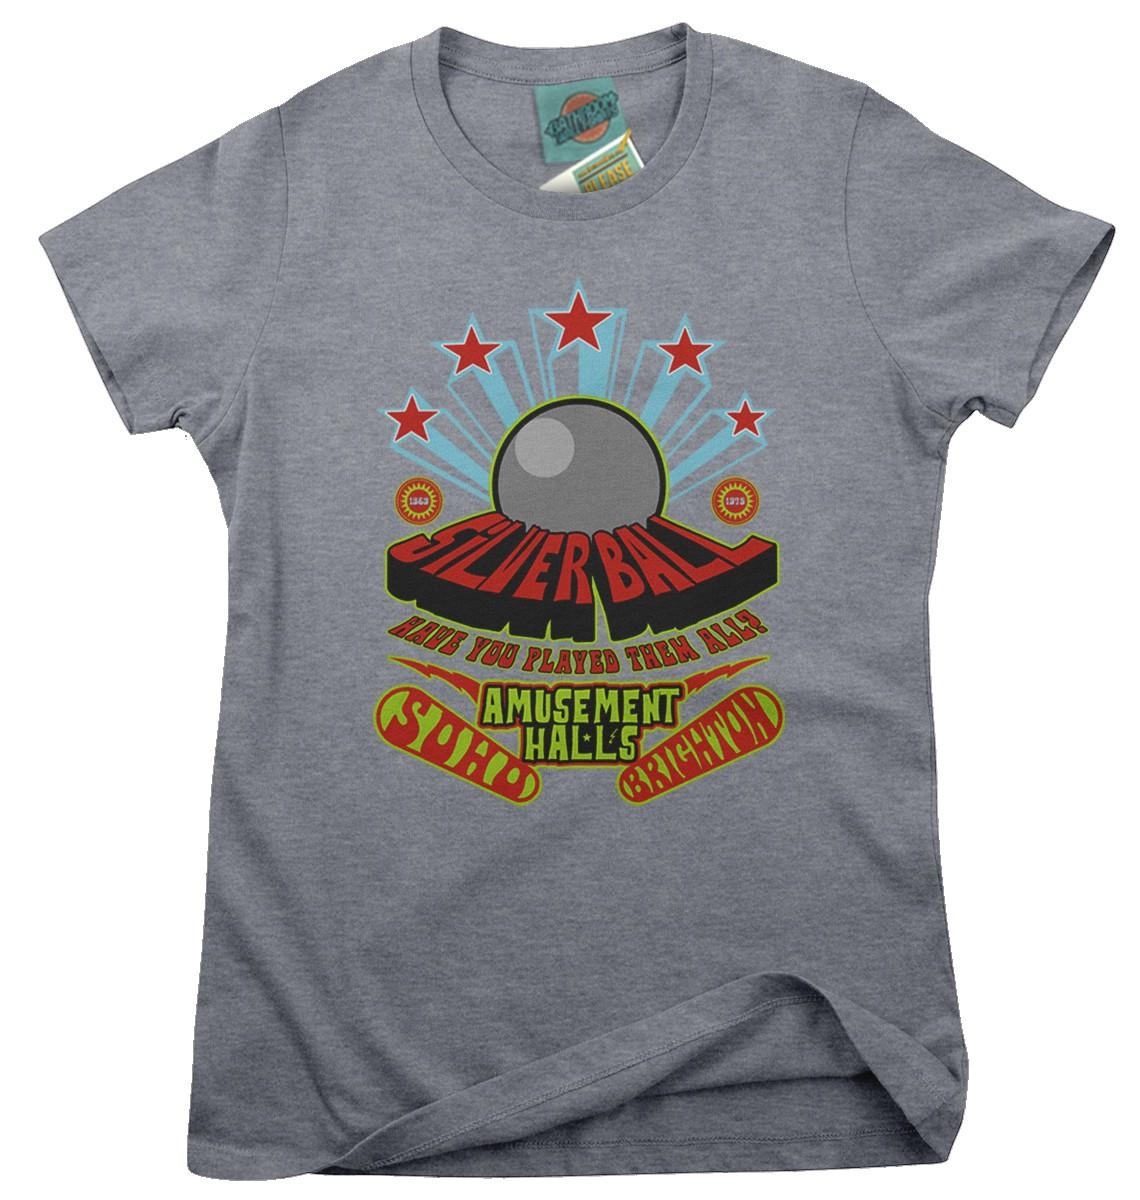 Who-inspired-Pinball-Wizard-Silver-Ball-Amusement-Hall-Femmes-T-Shirt